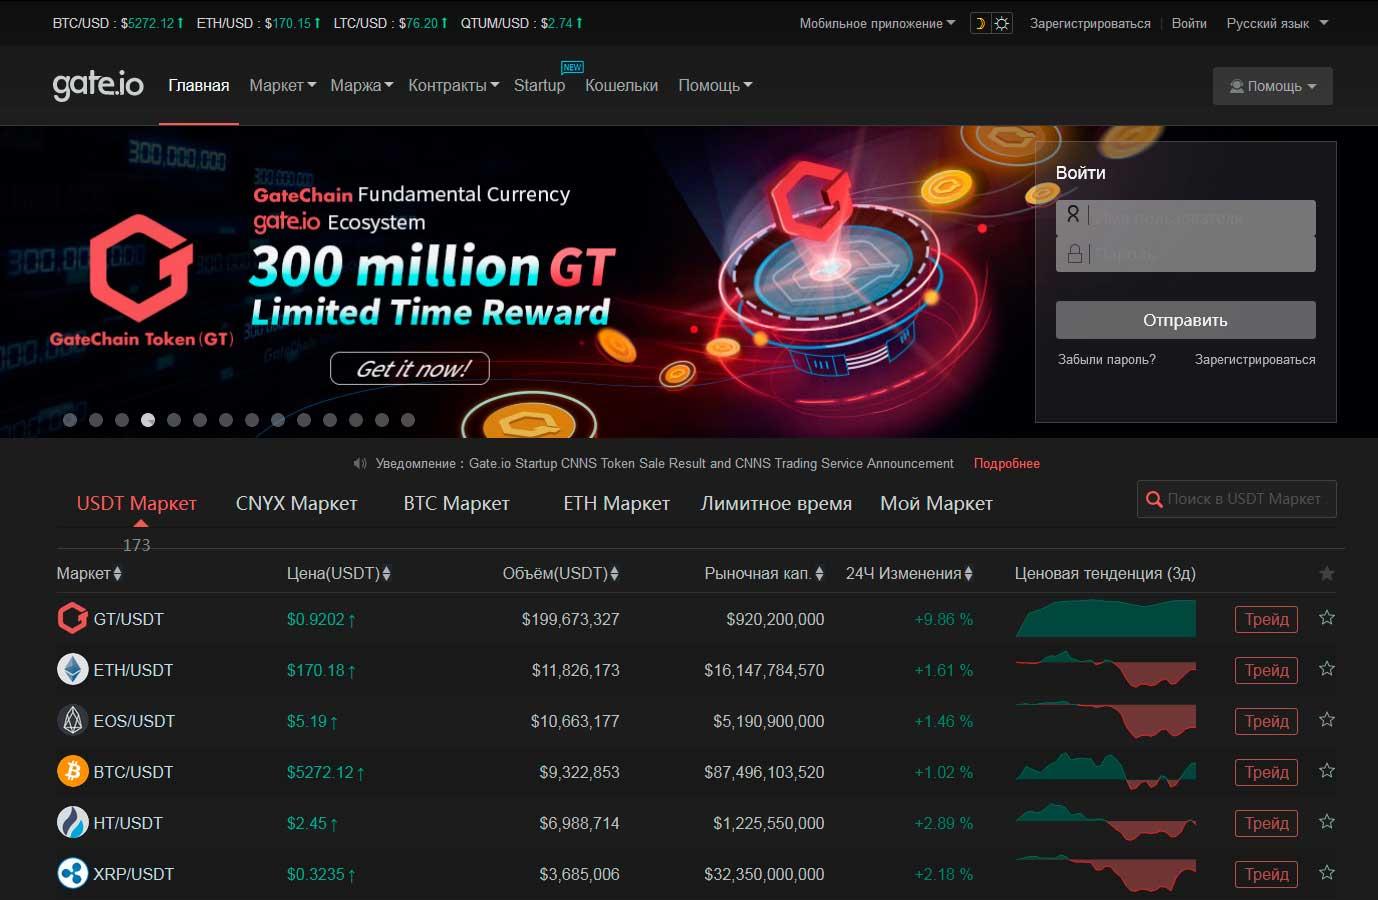 gate биржа официальный сайт